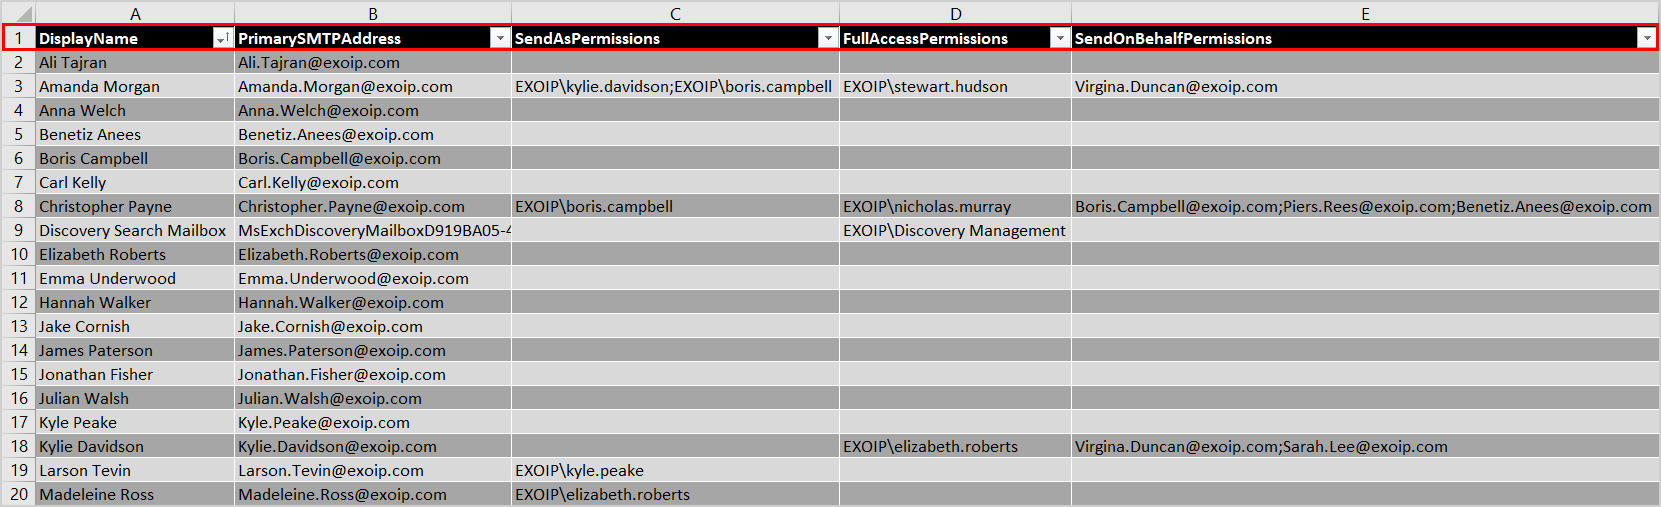 Export mailbox permissions to CSV file scripts folder CSV file